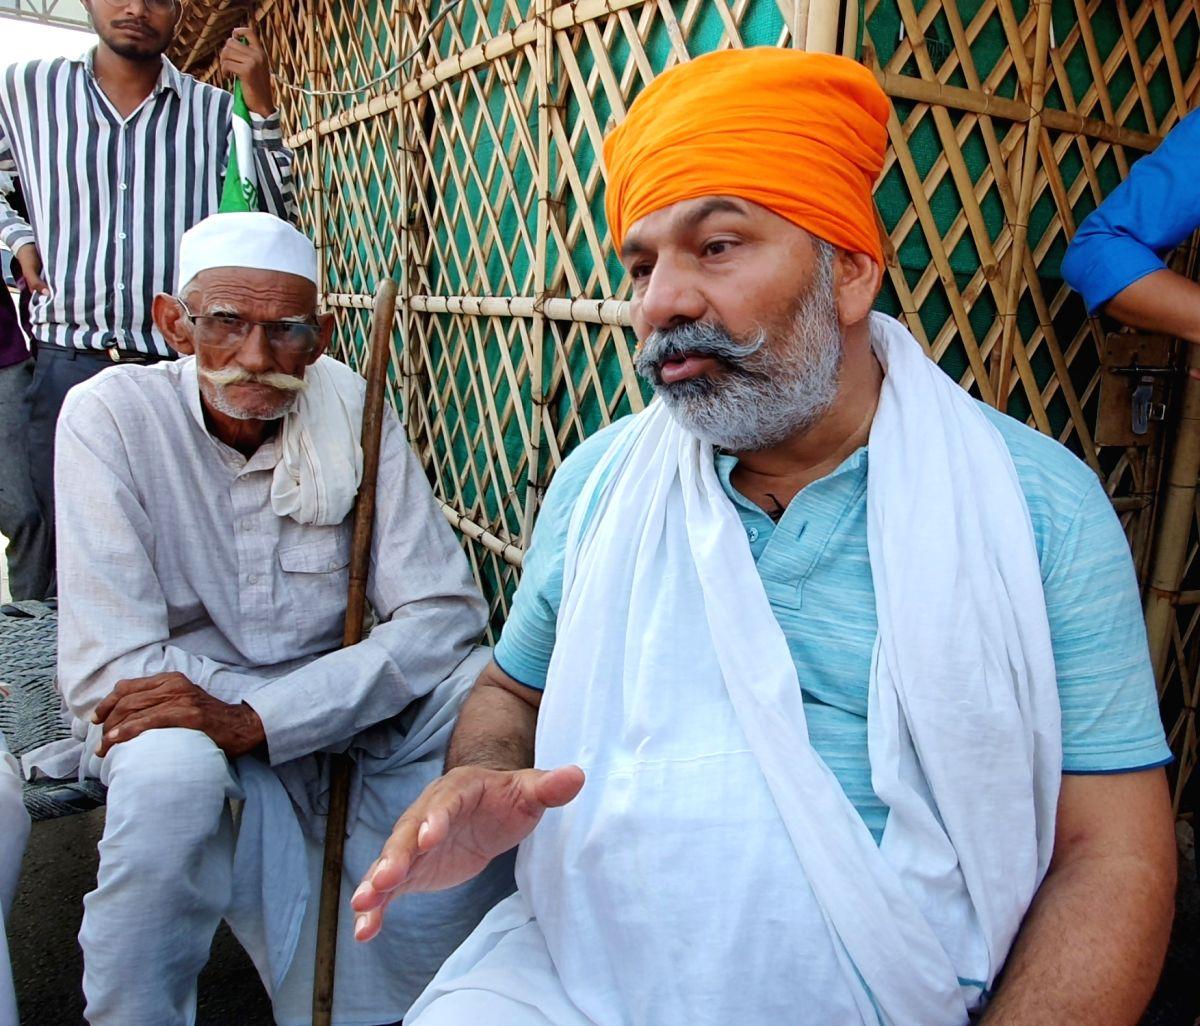 New Delhi: BKU leader Rakesh Tikait preparing Snacks for the agitating farmers, who have blocked National Highway against Farm law at Ghazipur border in New Delhi on Monday, September 27, 2021. (Photo: Anupam Gautam/ IANS)